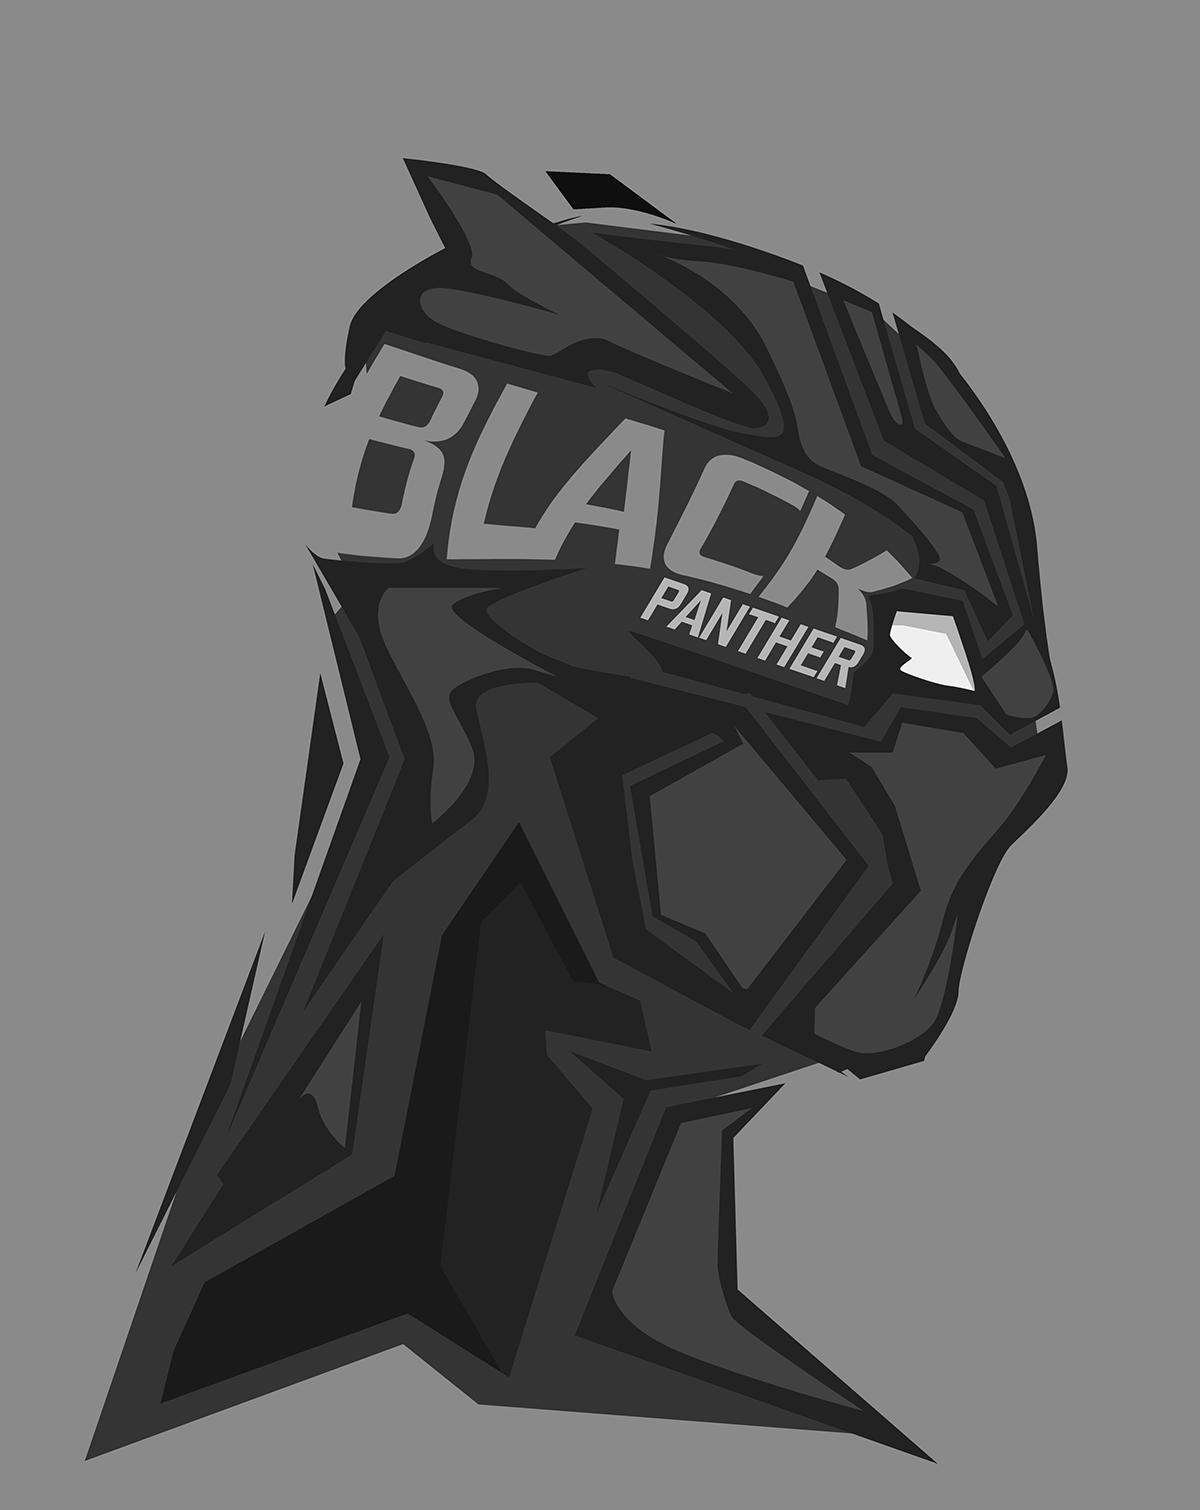 Great Wallpaper Marvel Falcon - Marvel_Divas_Batman_Black_Panther_Flash_Falcon_cyclone_Punisher_DC_Comics-41566  HD_6474100.png!d